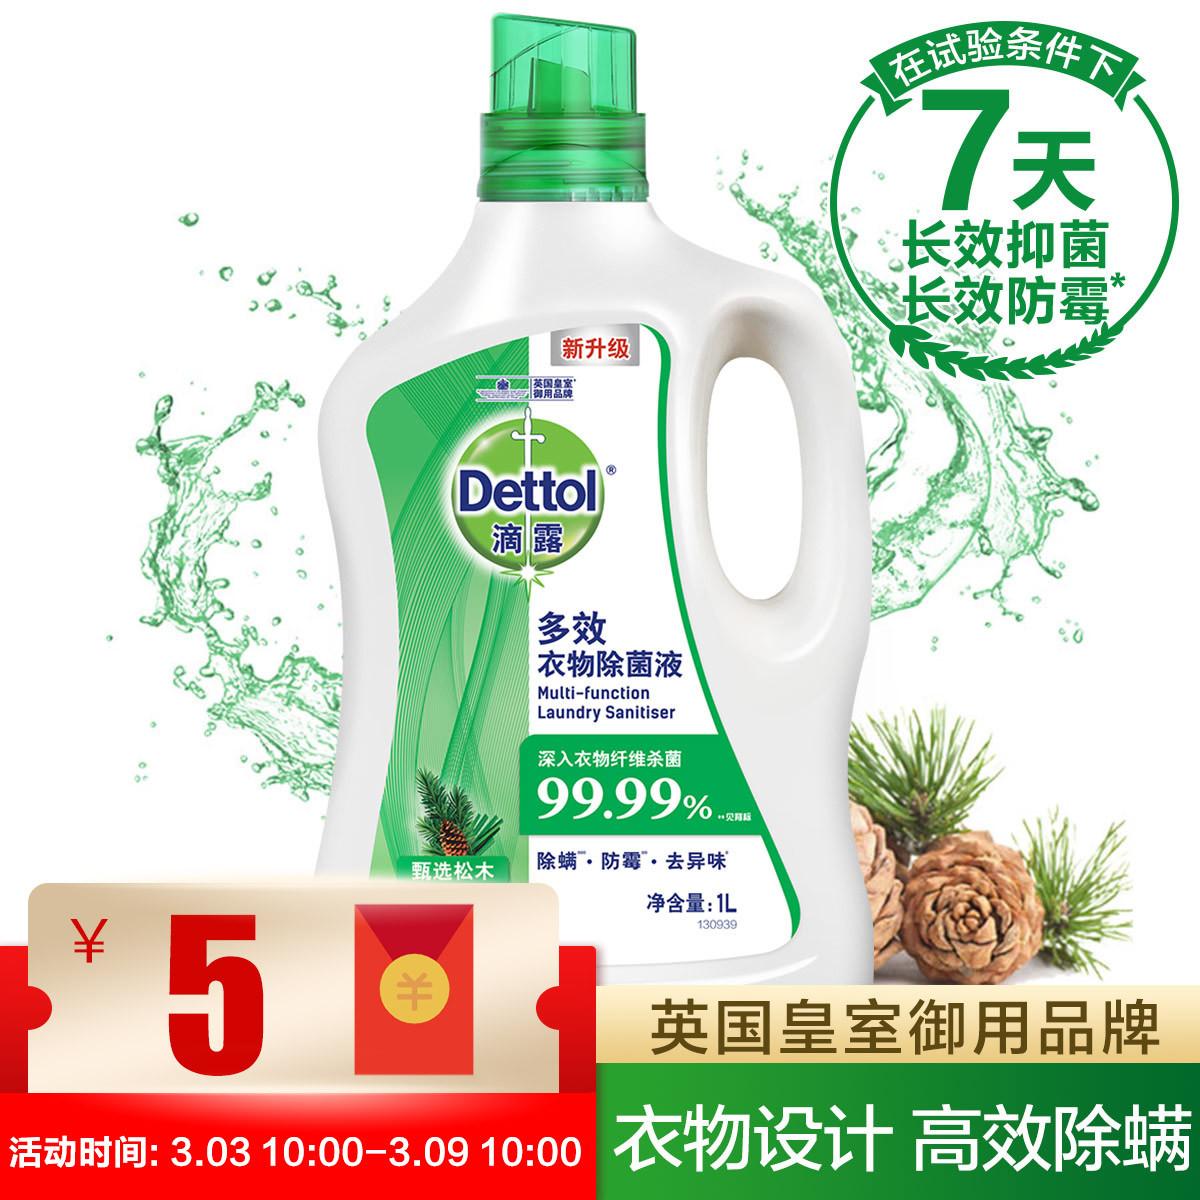 Dettol 【7天长效抑菌防霉】杀菌99.99%滴露新品多效衣物除菌液1L